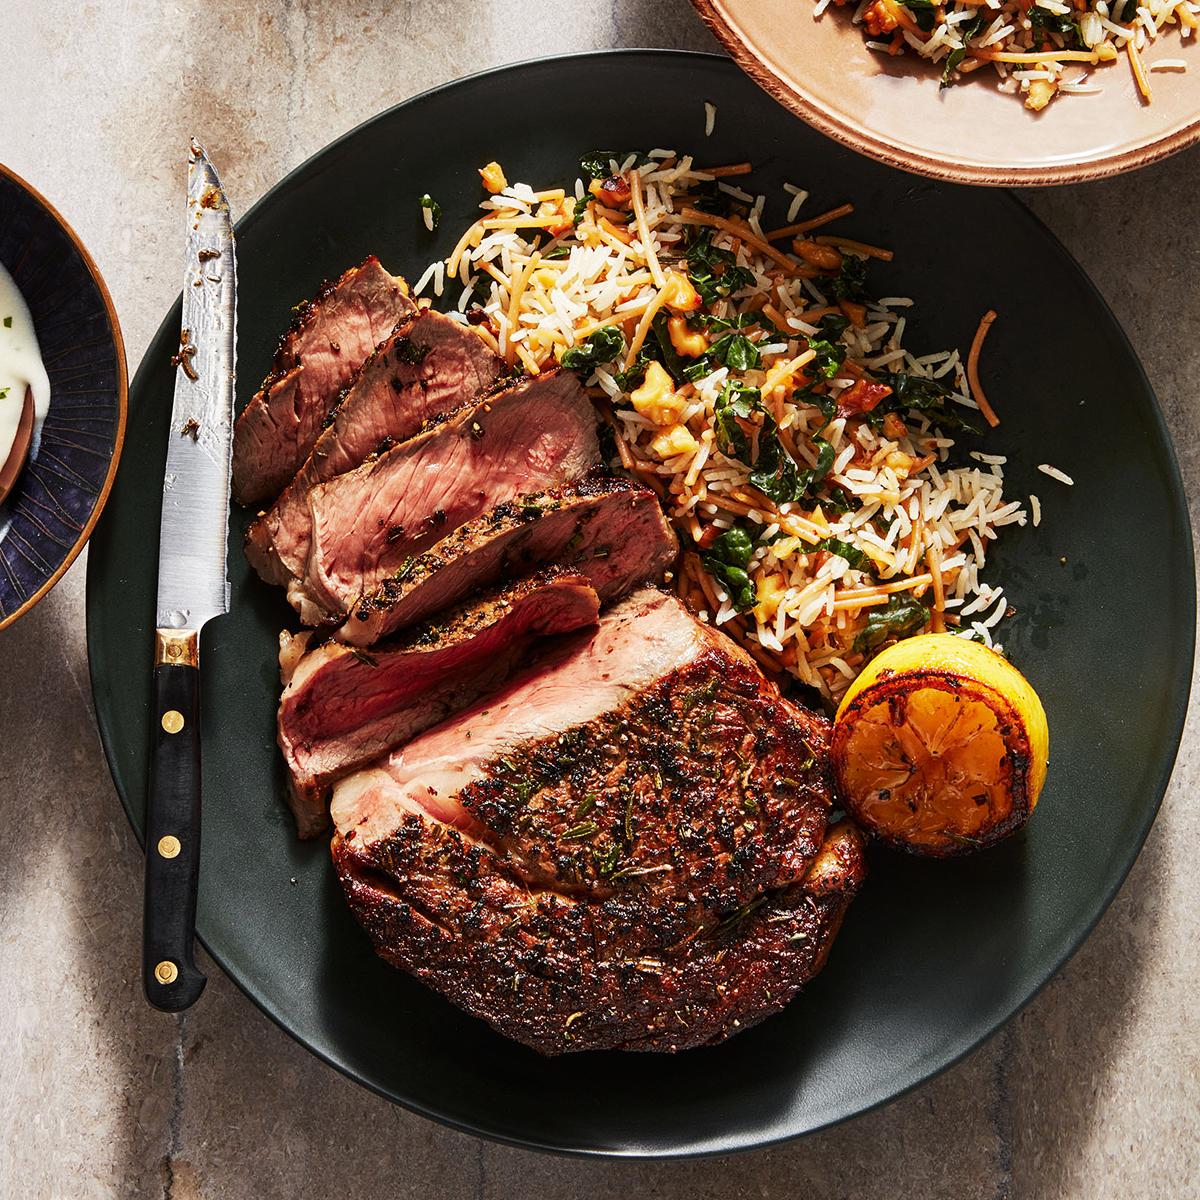 Rachael Ray's Rib Eye Steaks with Gorgonzola Sauce & Kale-Walnut Vermicelli Rice